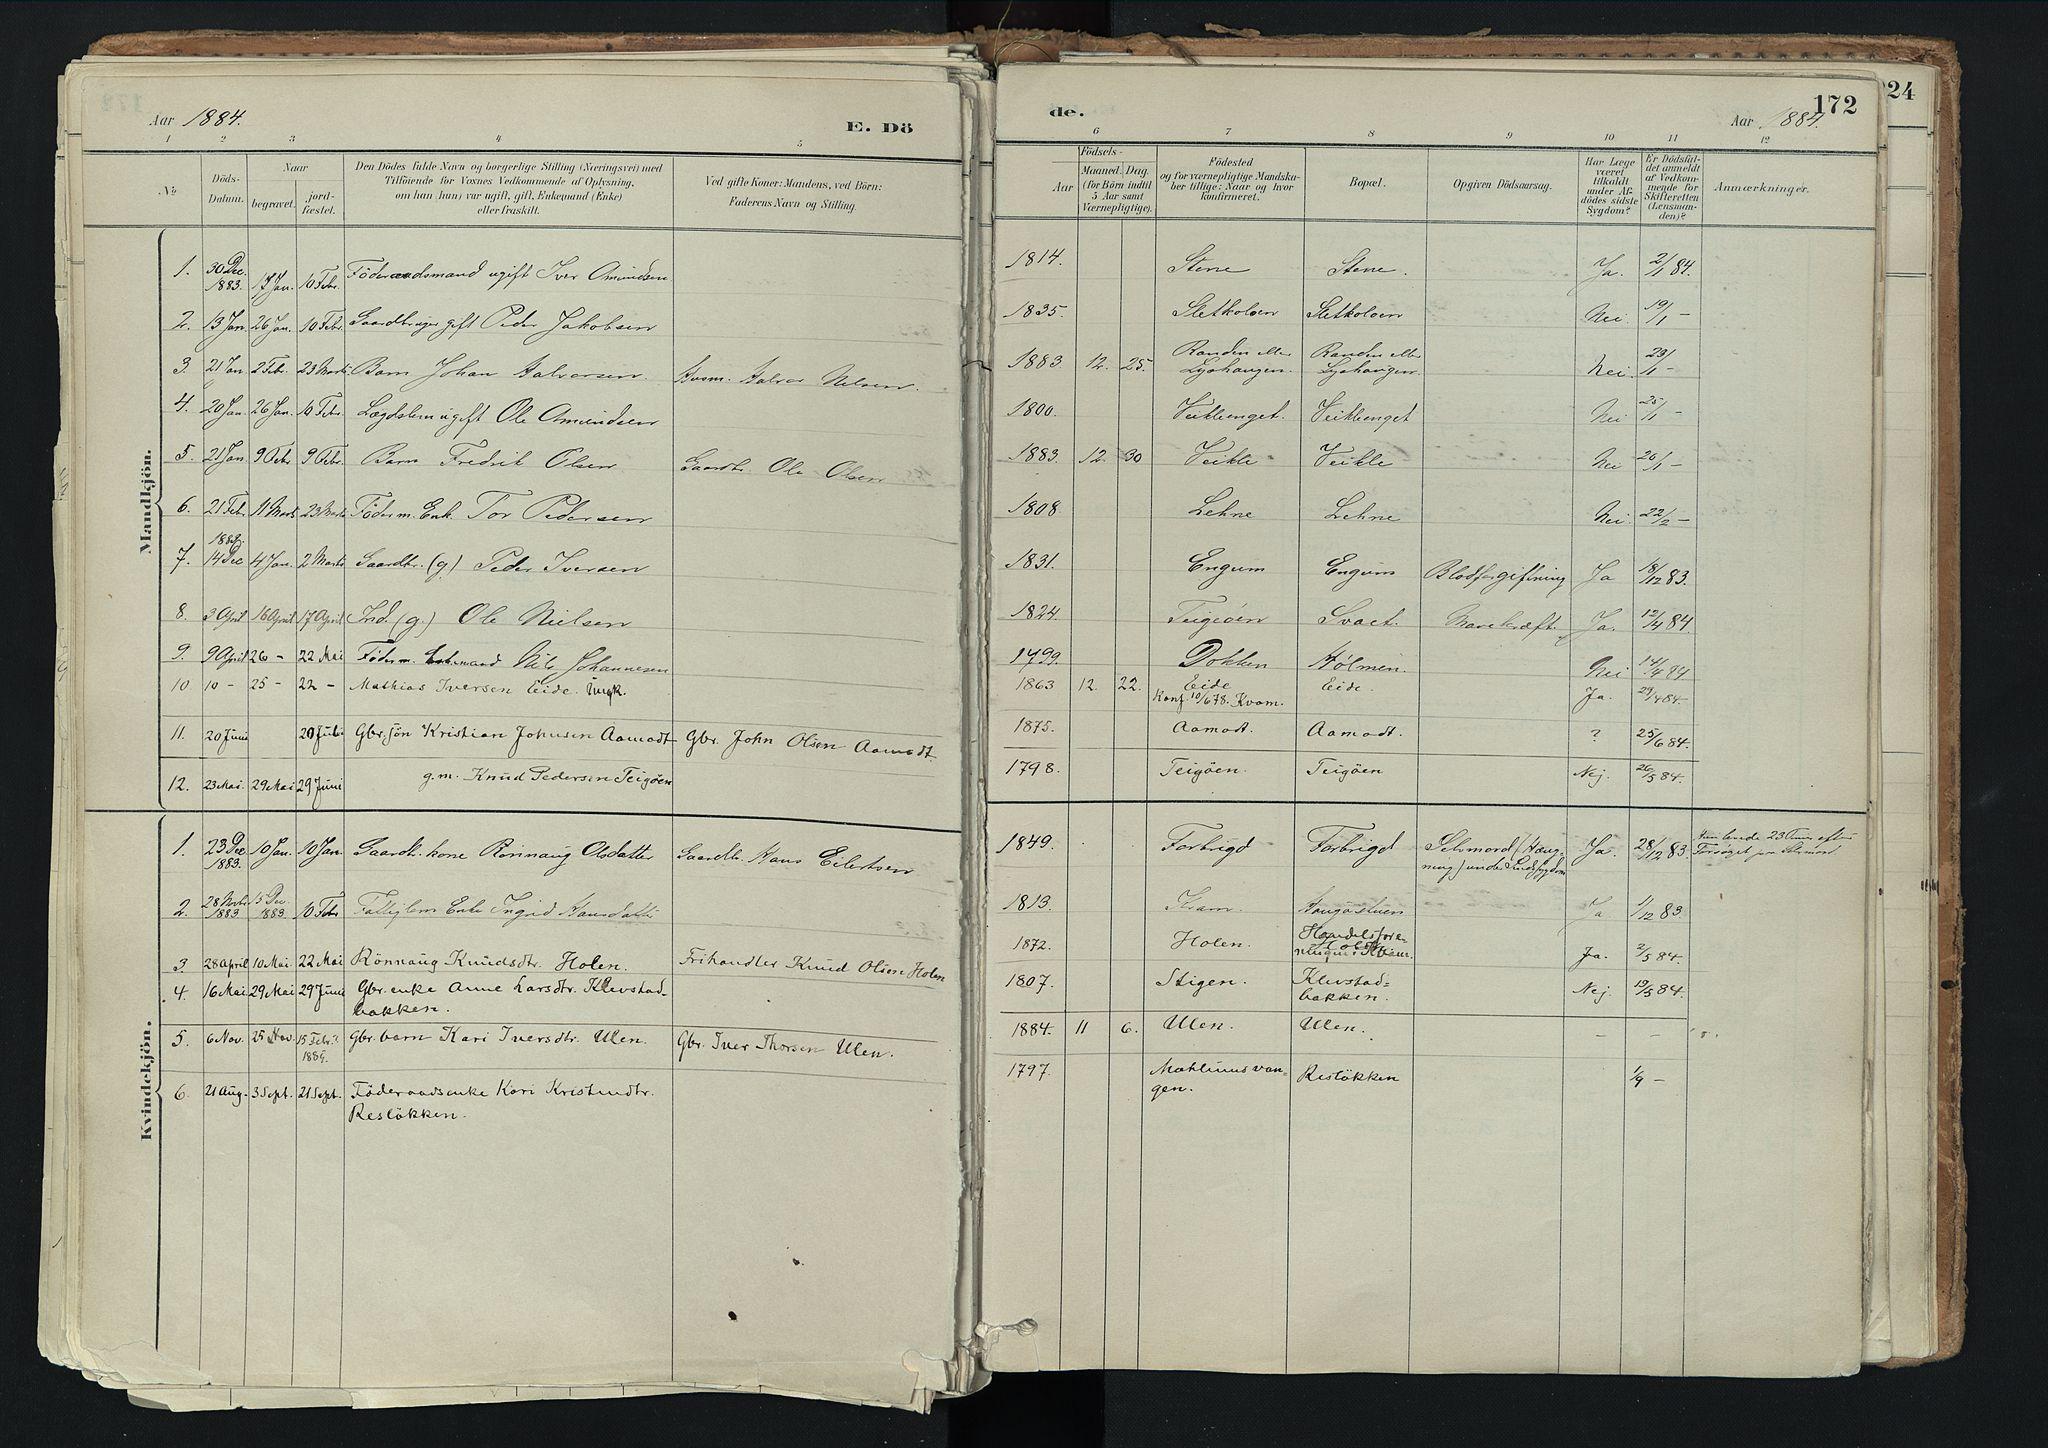 SAH, Nord-Fron prestekontor, Ministerialbok nr. 3, 1884-1914, s. 172